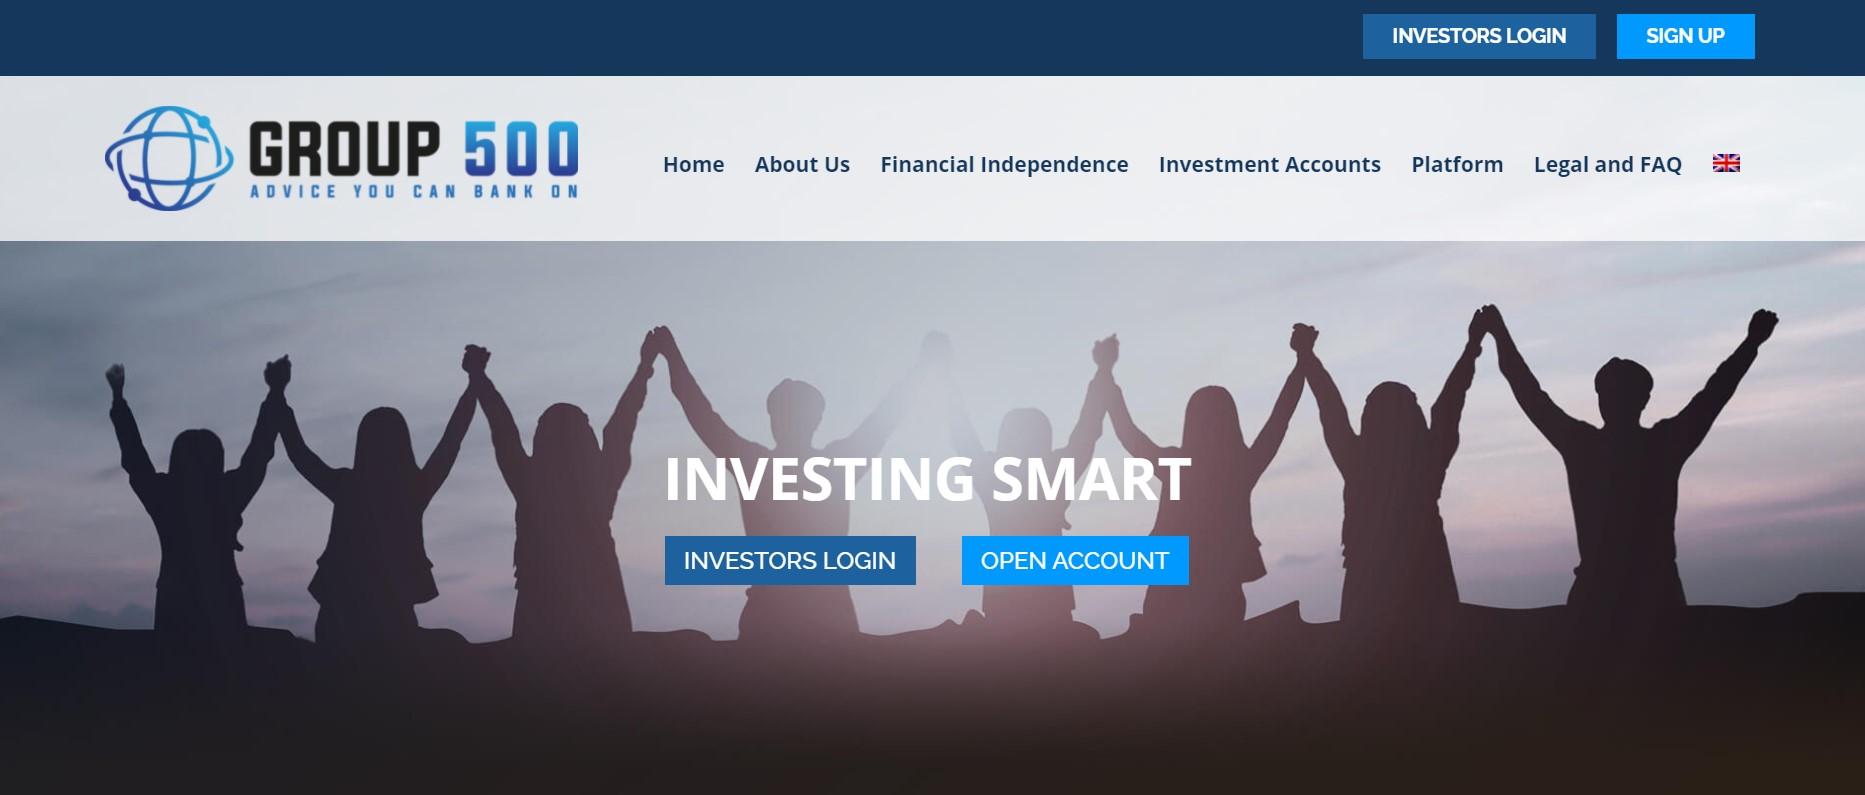 Group 500 website